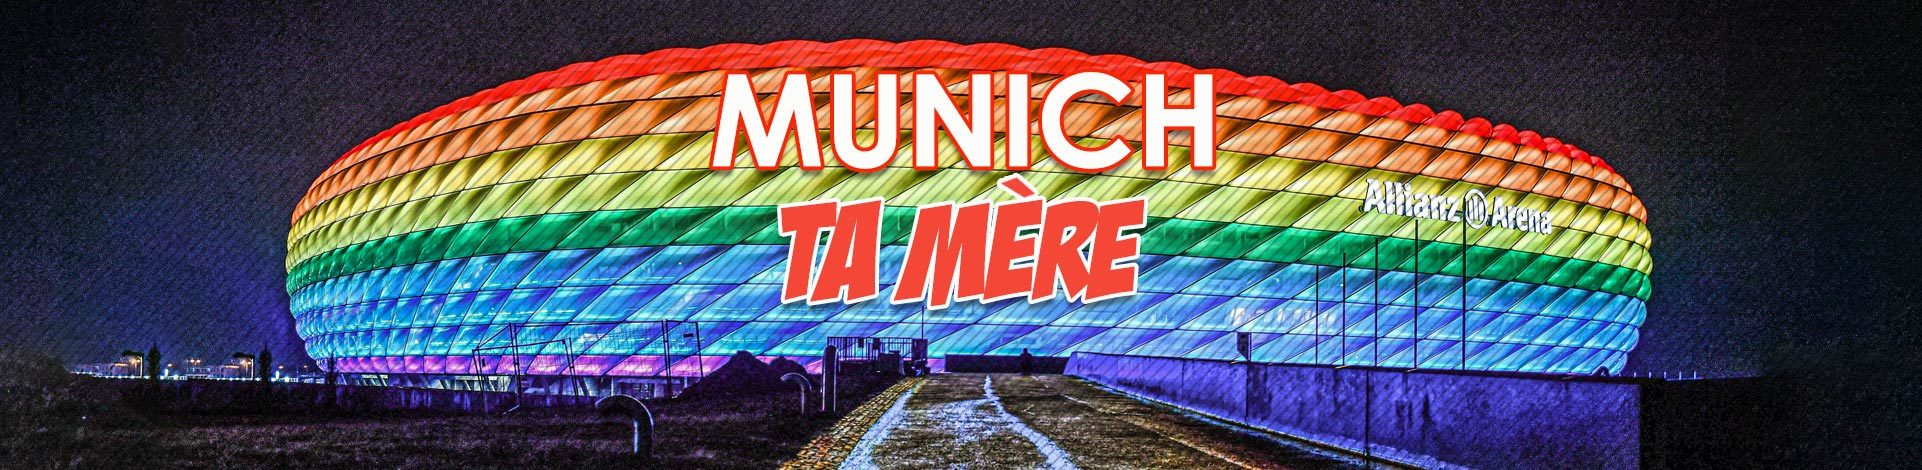 Munich ta mère virage psg